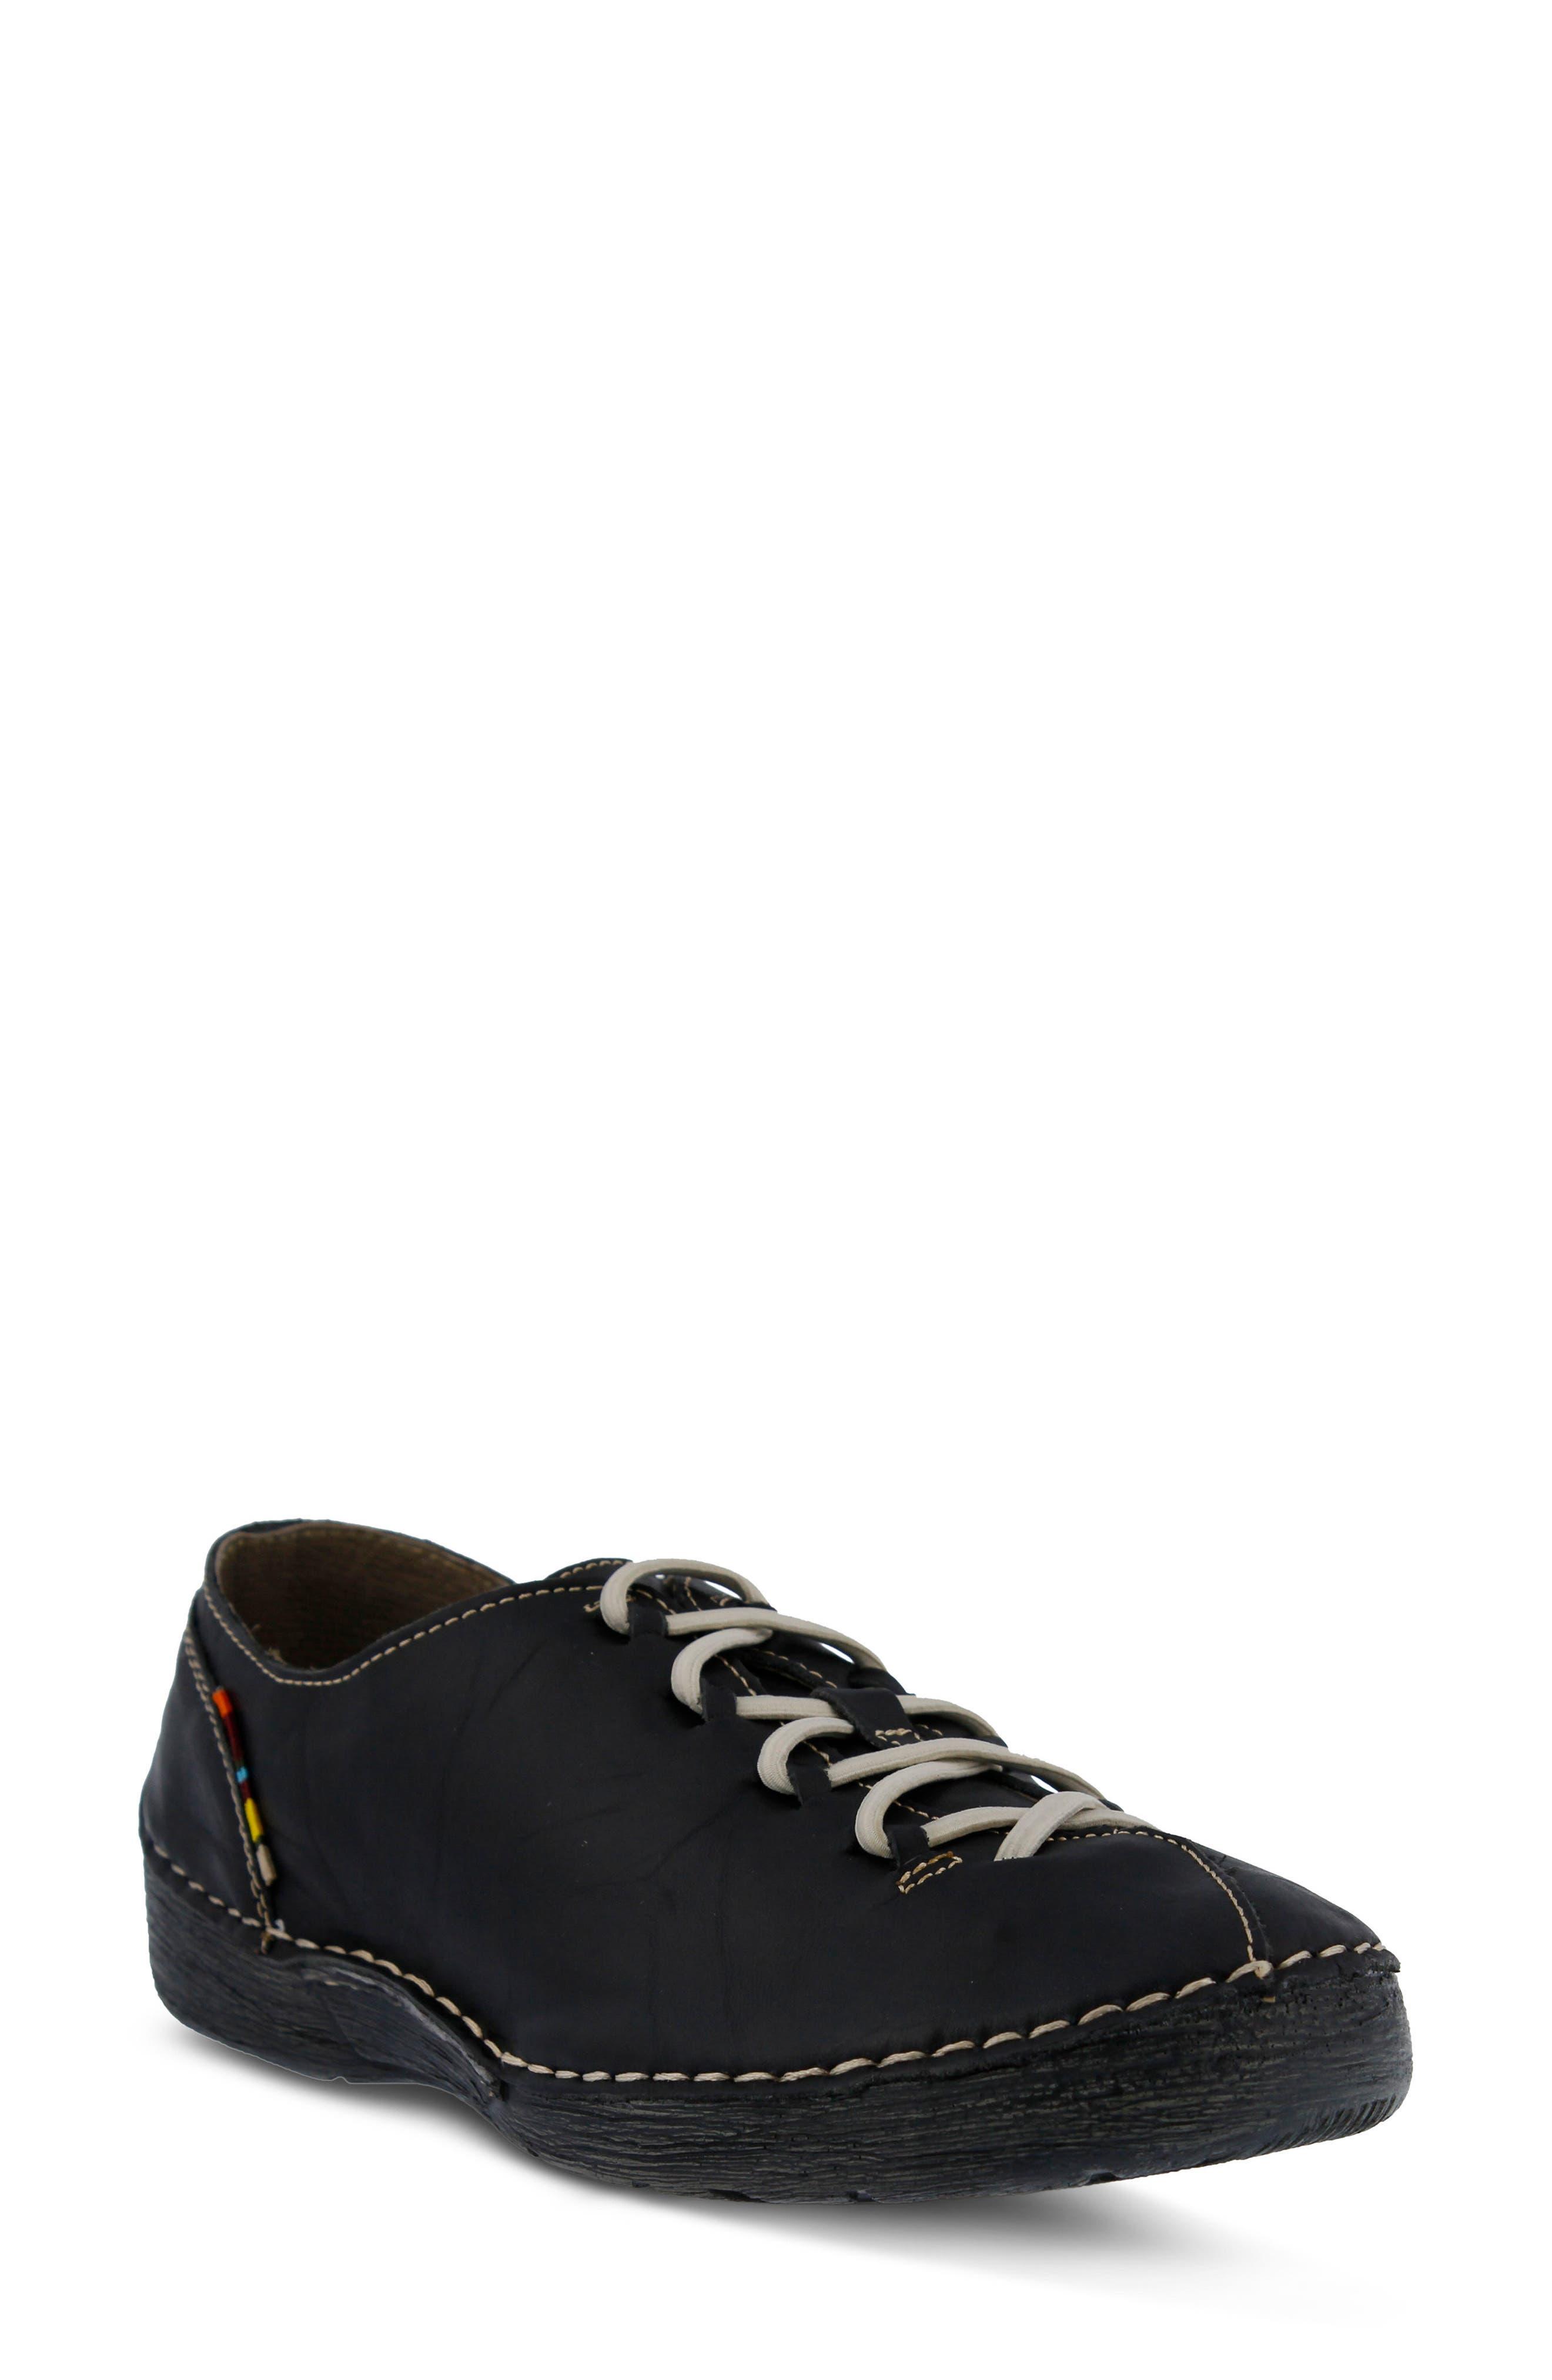 Carhop Sneaker,                         Main,                         color, BLACK LEATHER